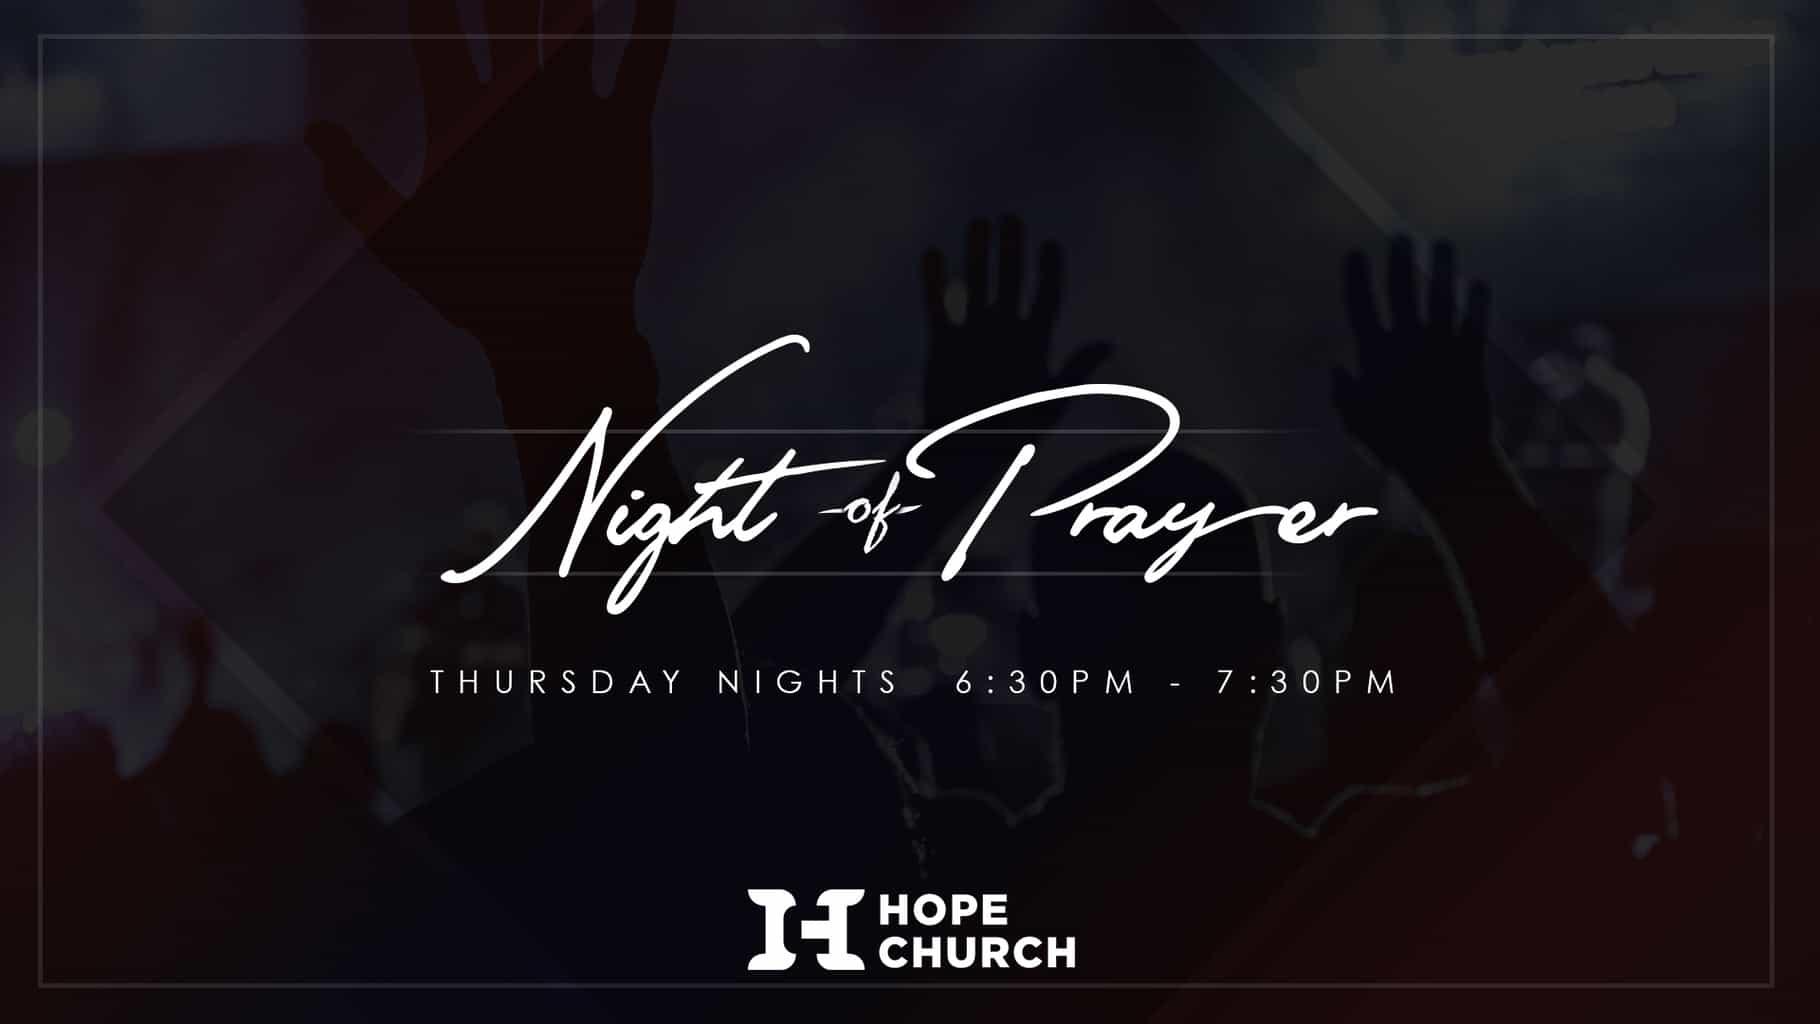 Night of Prayer Placeholder